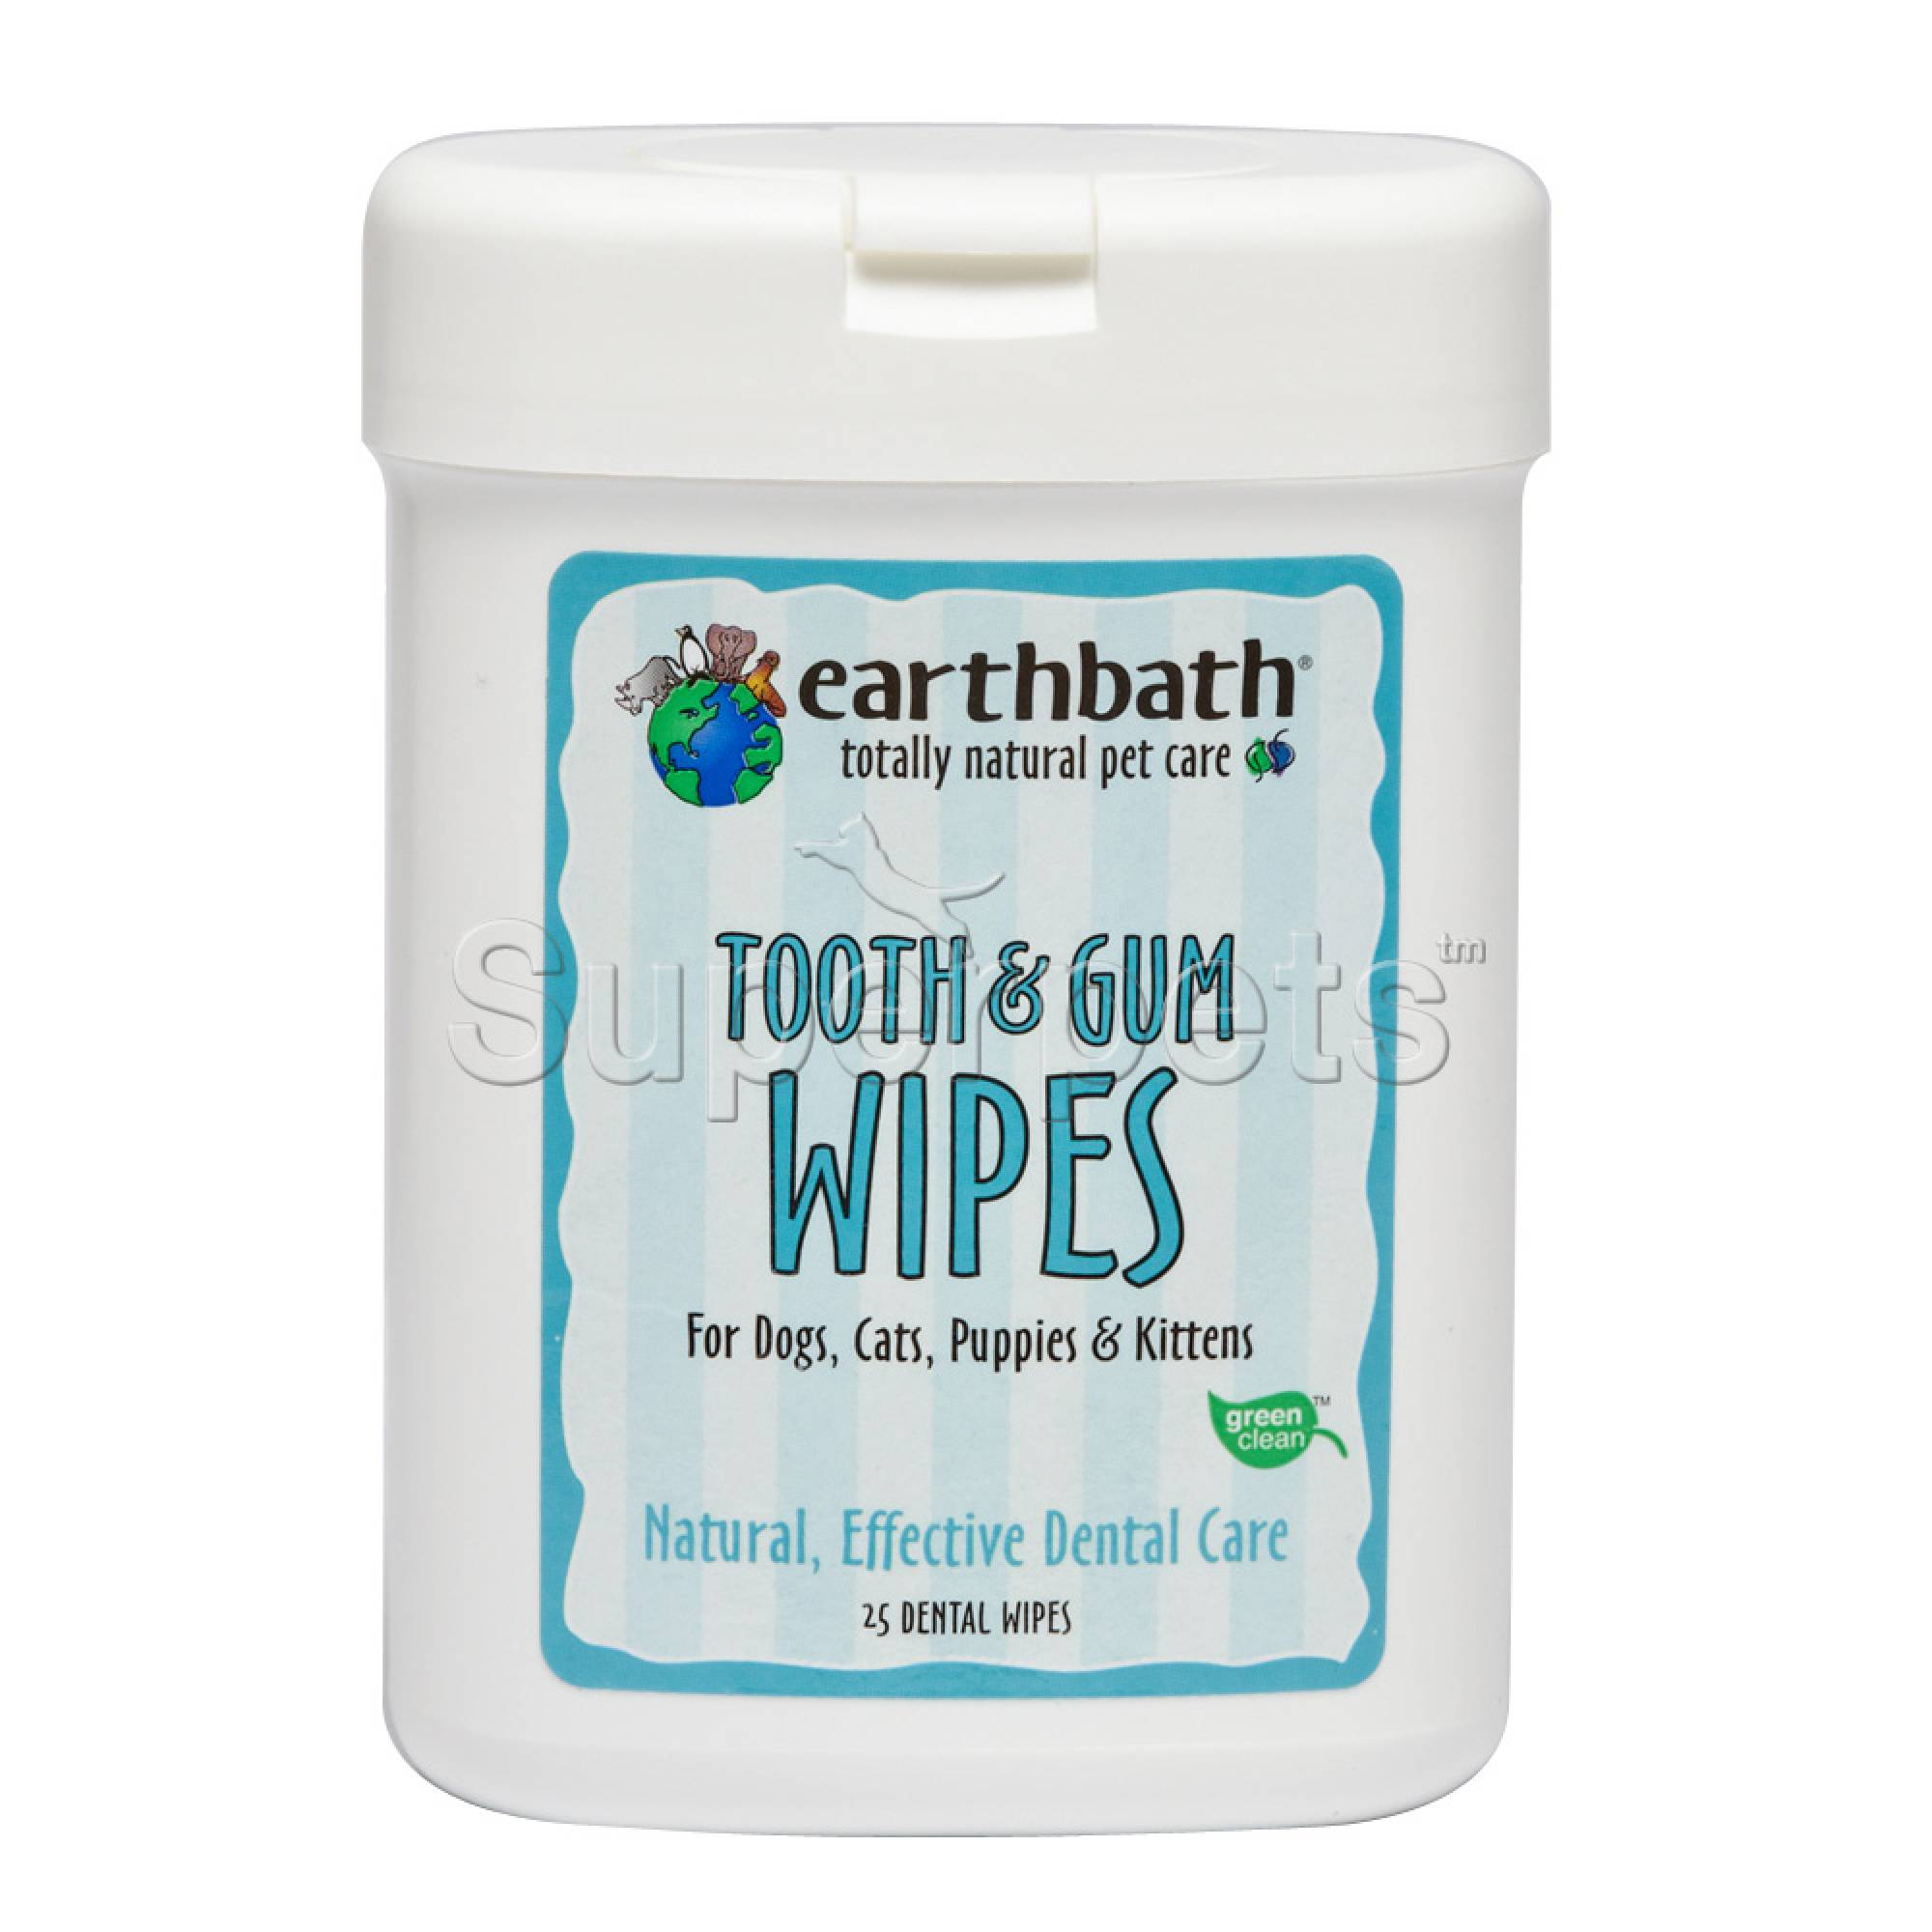 Earthbath EB042 Tooth & Gum Wipes x25pcs